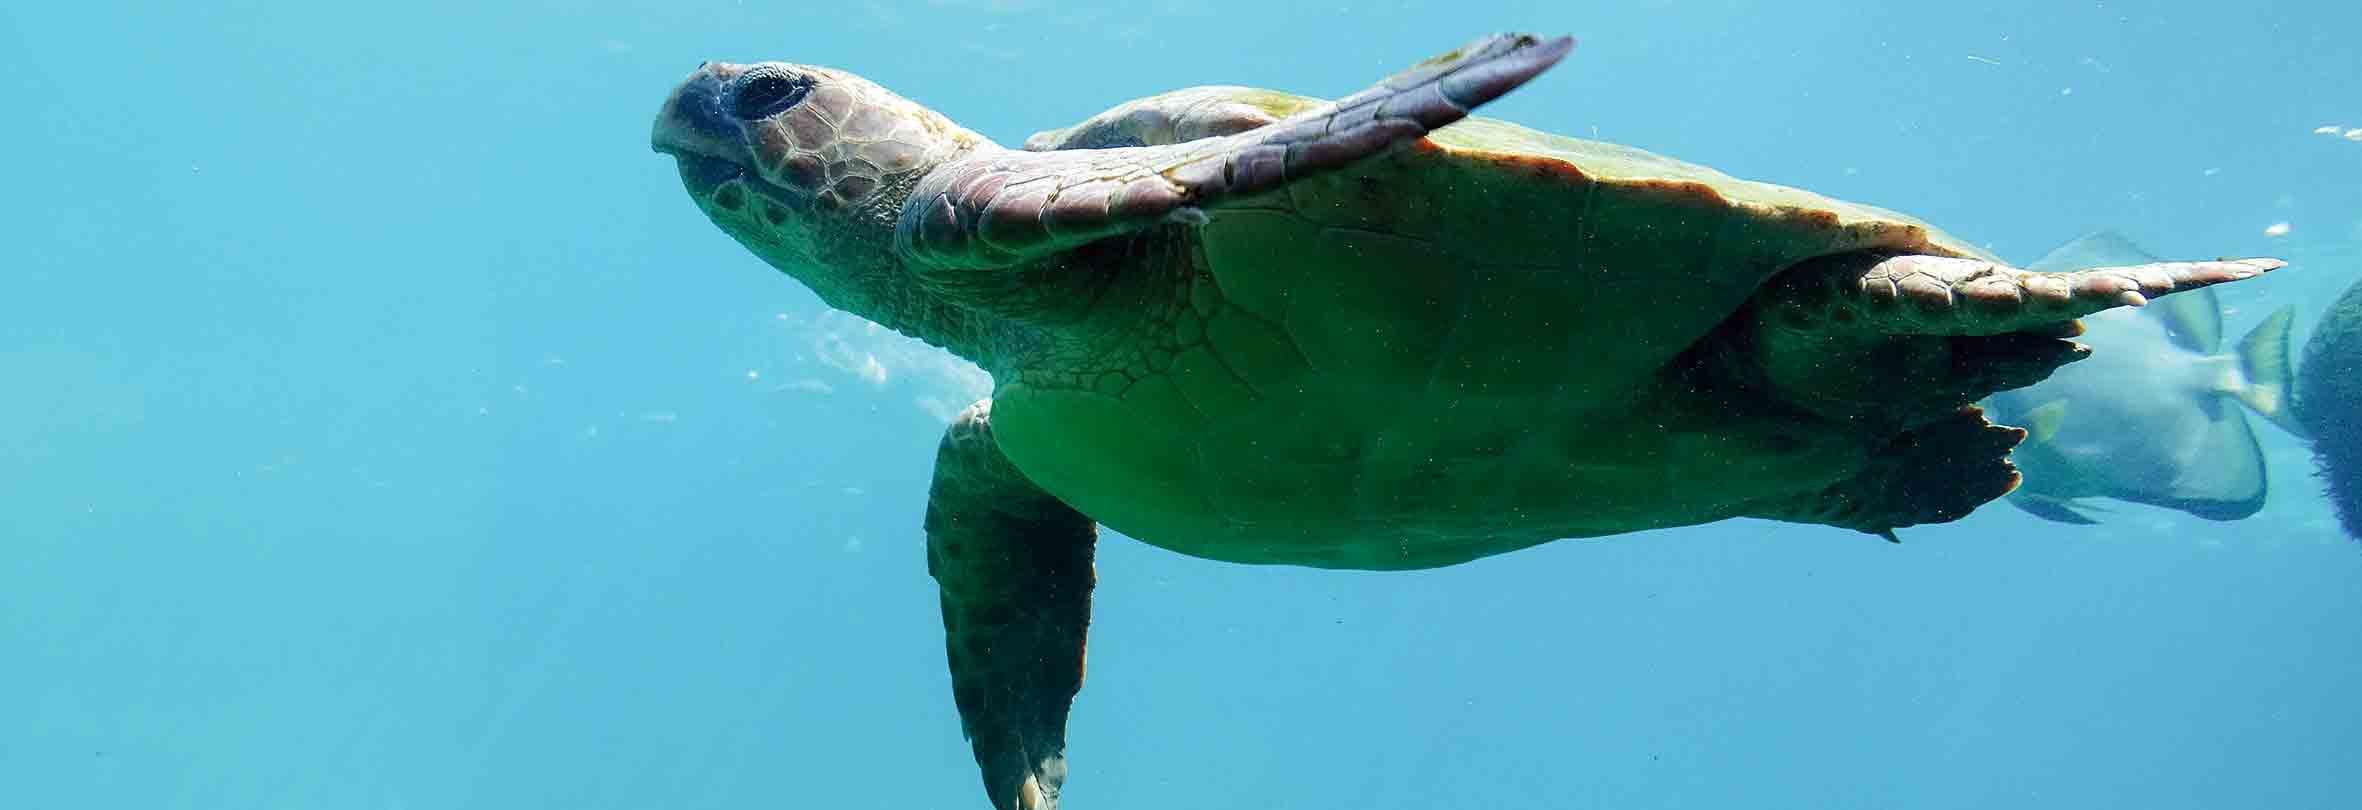 Schildkröte, La Réunion